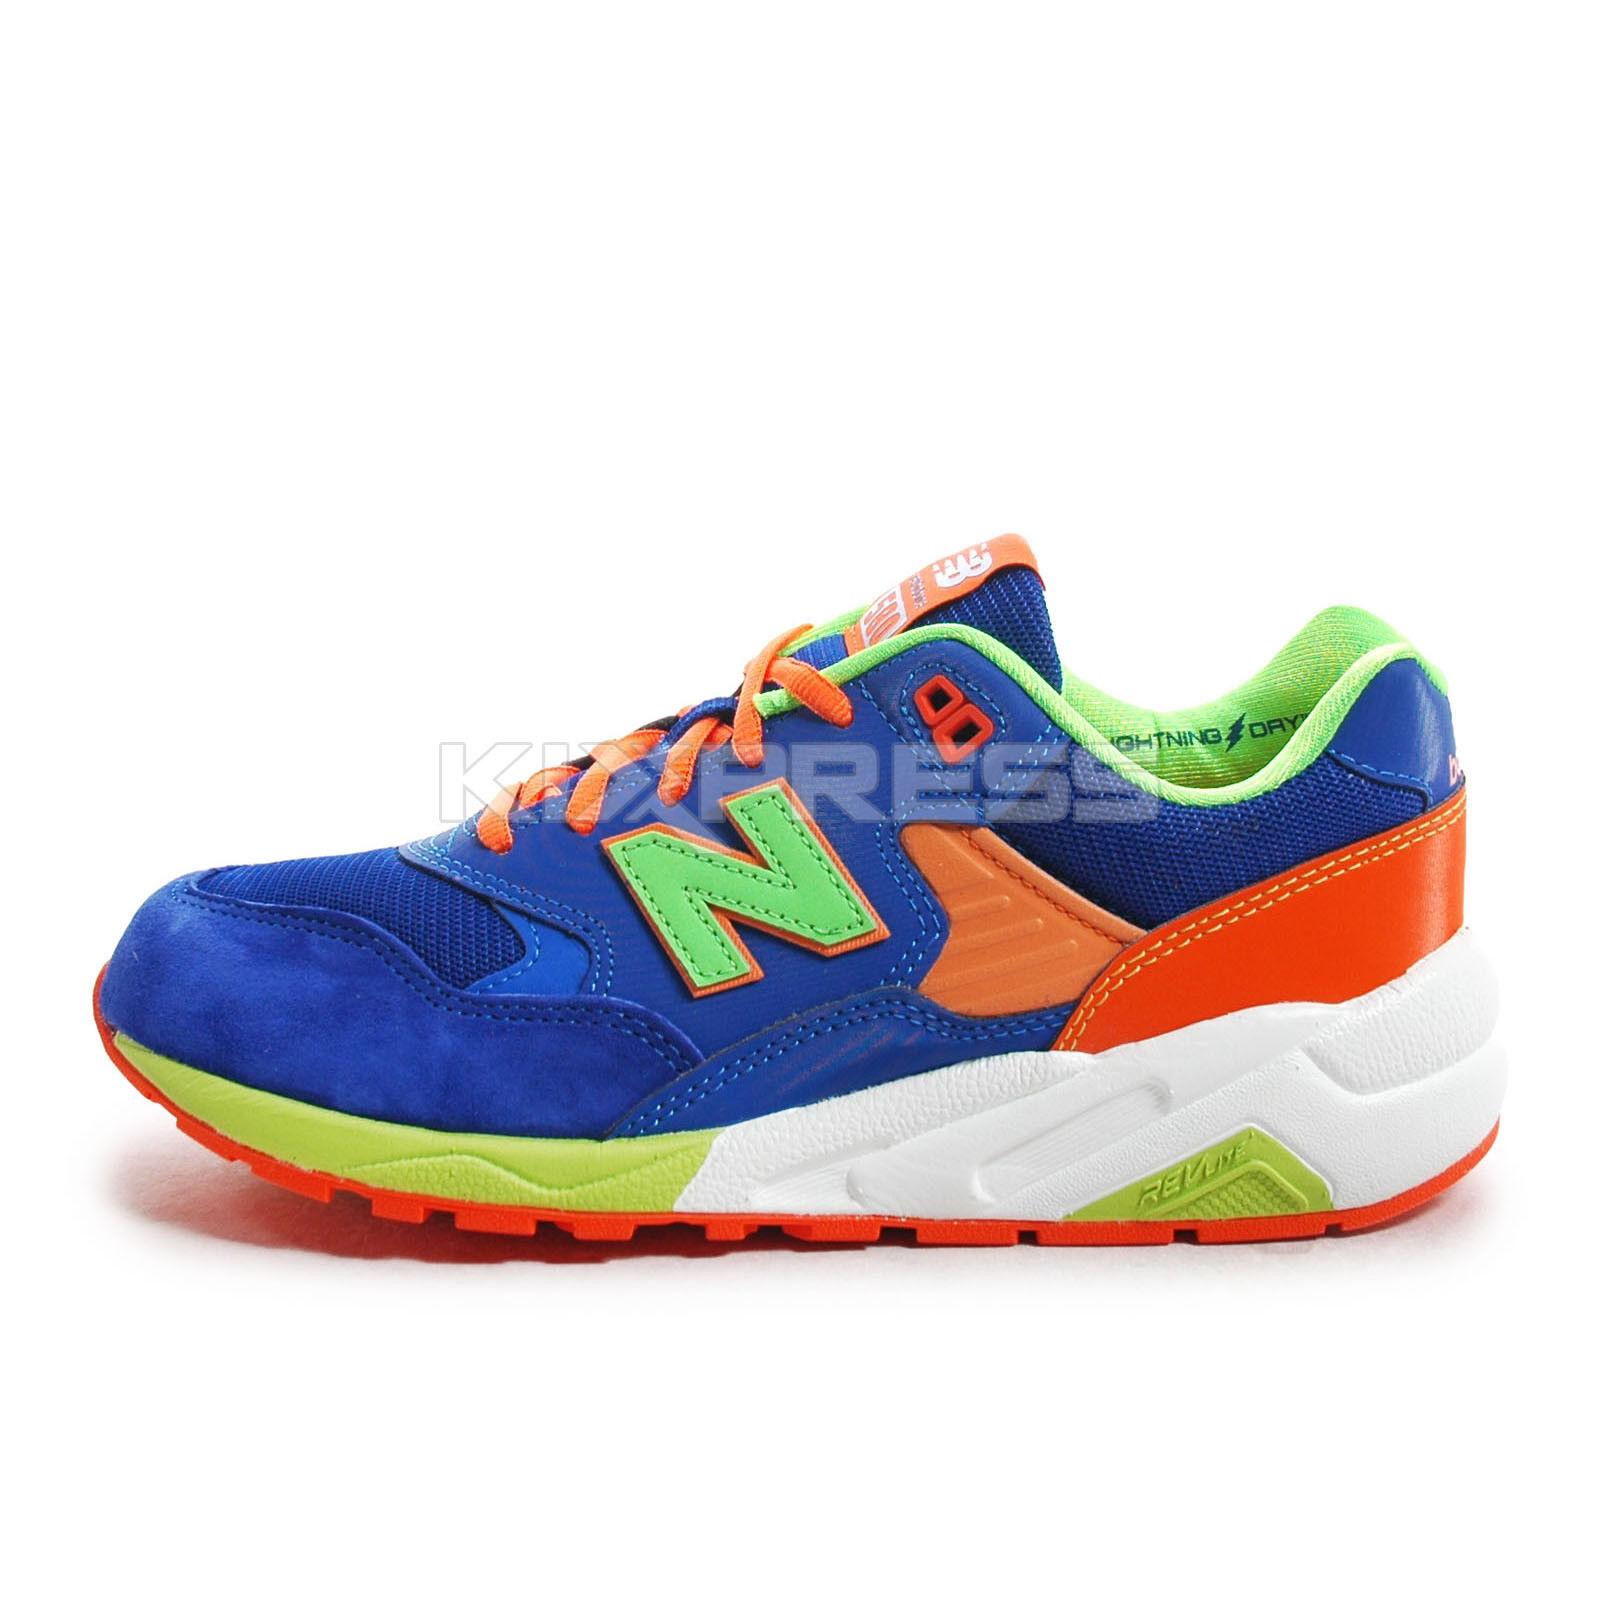 New Balance MRT530 Classic  Running Cobalt blu  arancia  per poco costoso